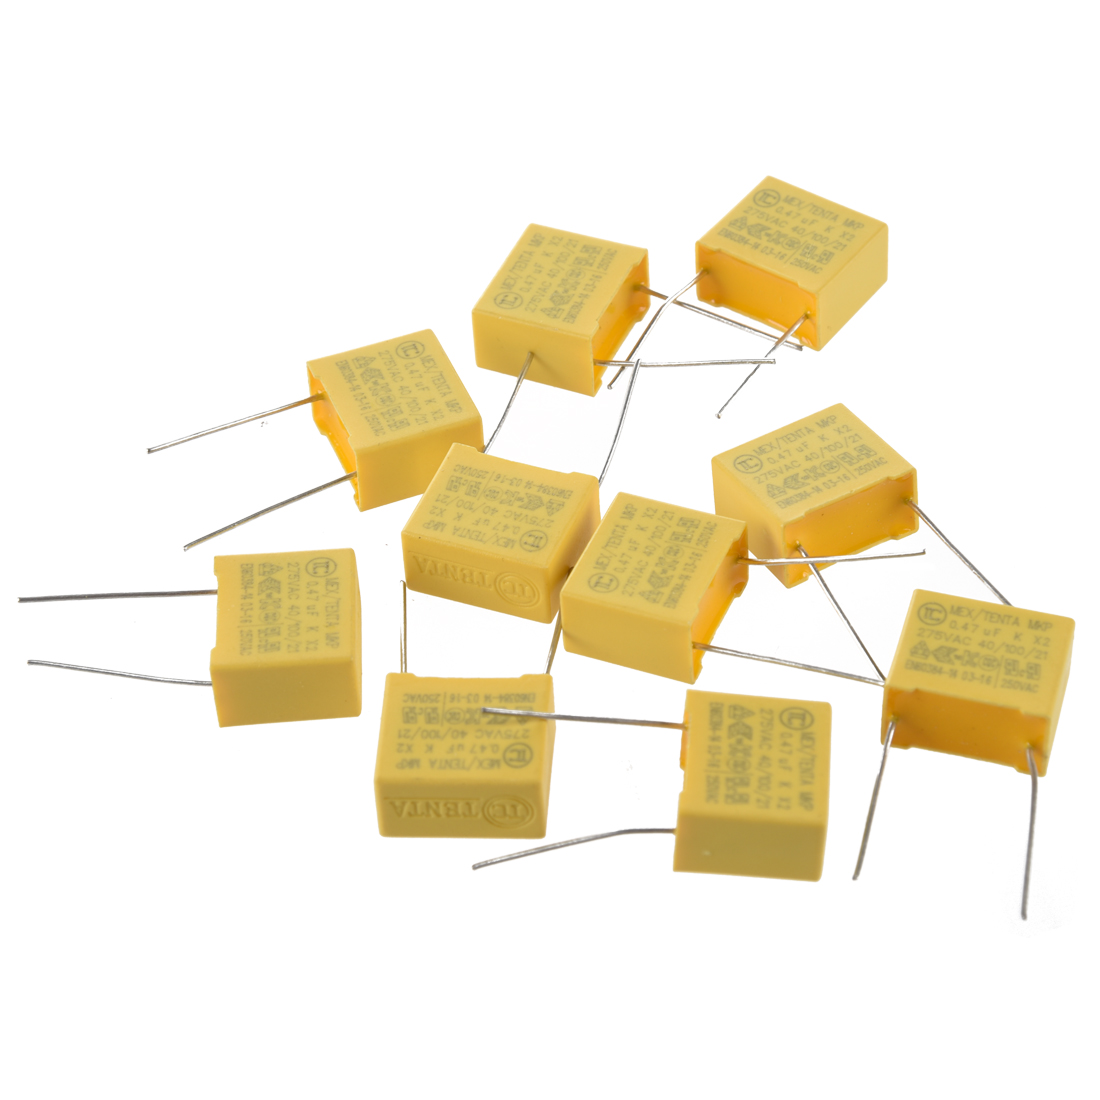 3X-AC-275V-0-47uF-Condensadores-de-seguridad-de-pelicula-de-poropileno-10pz-K8A9